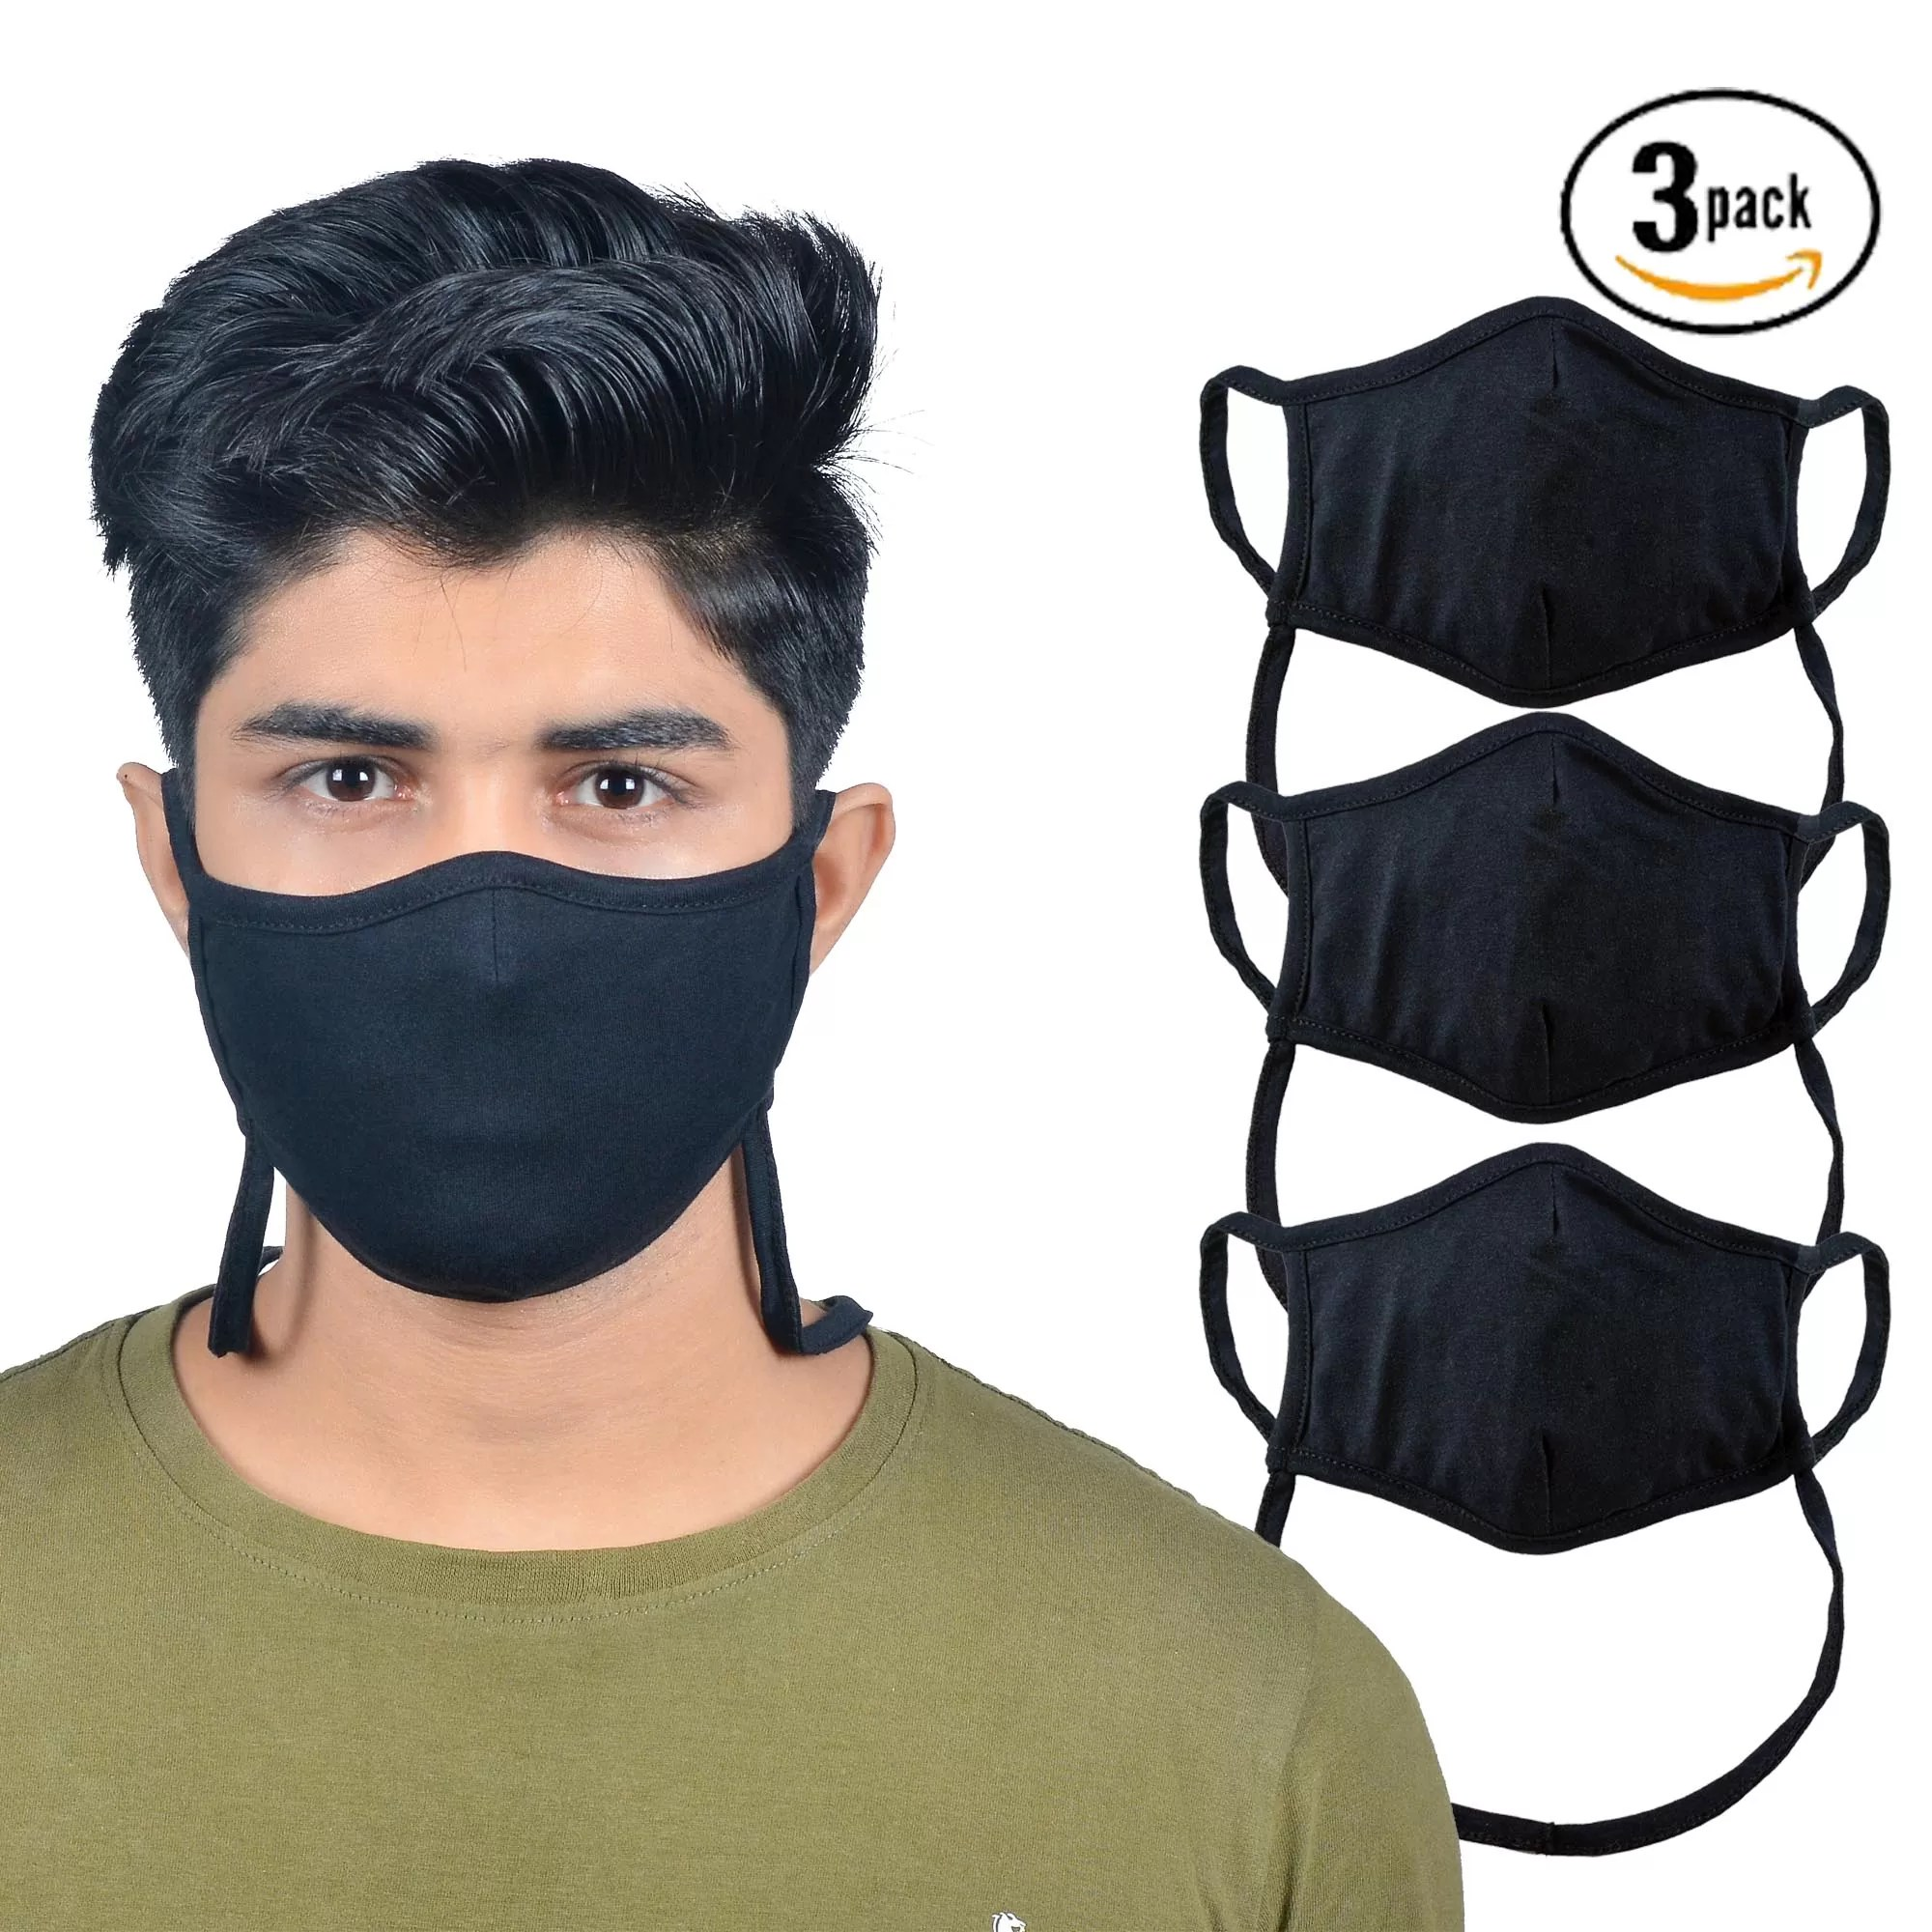 Adult Neck Strap Face Mask